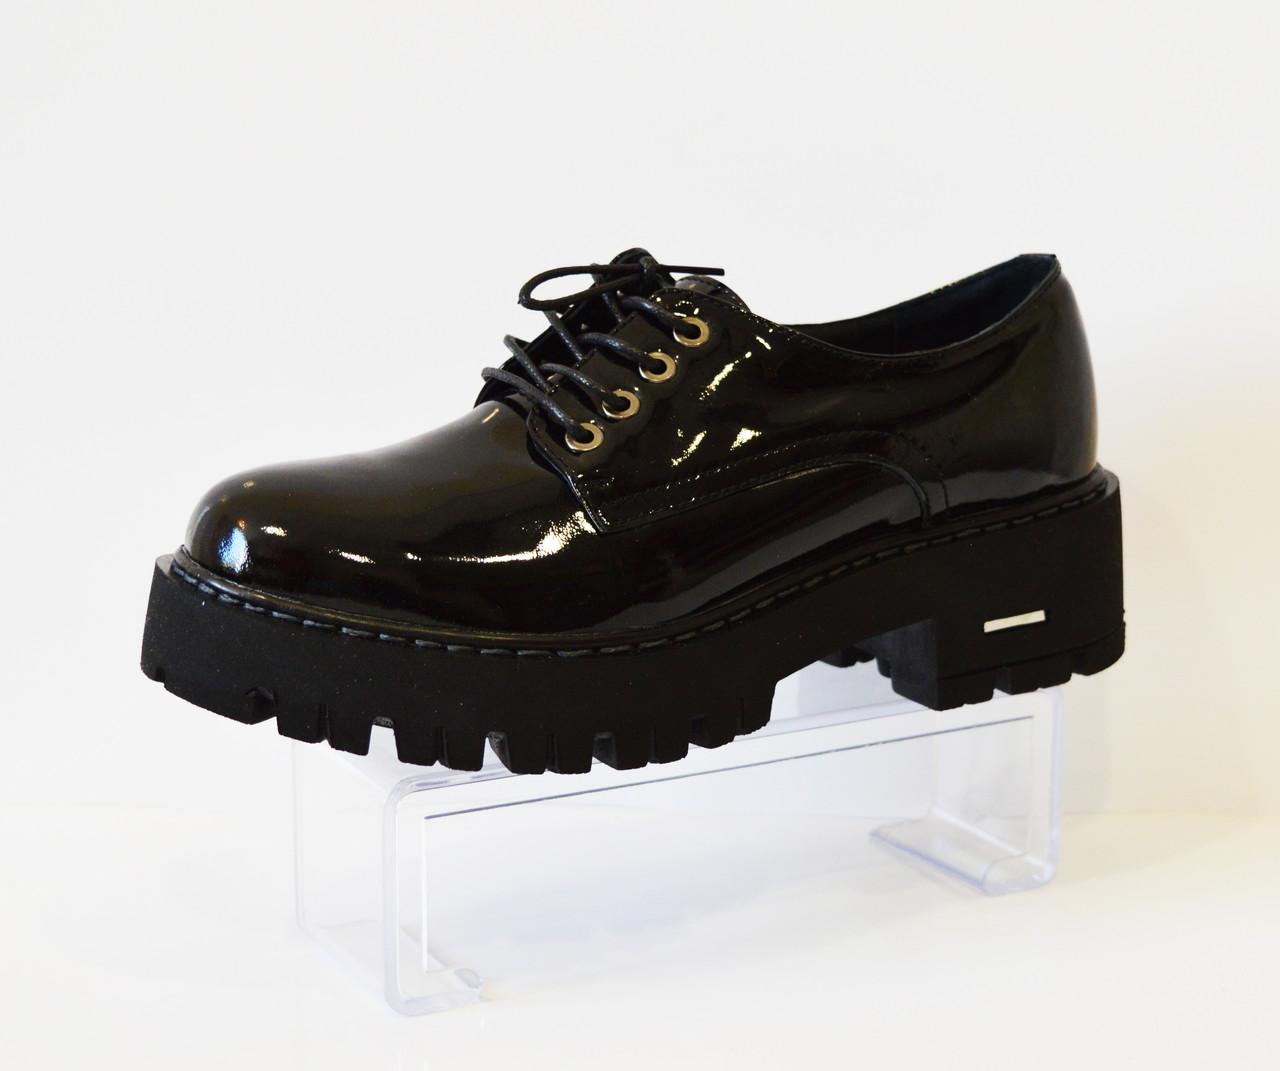 c2bb979b Женские туфли на платформе Selesta 2401 - КРЕЩАТИК - интернет магазин обуви  в Александрии